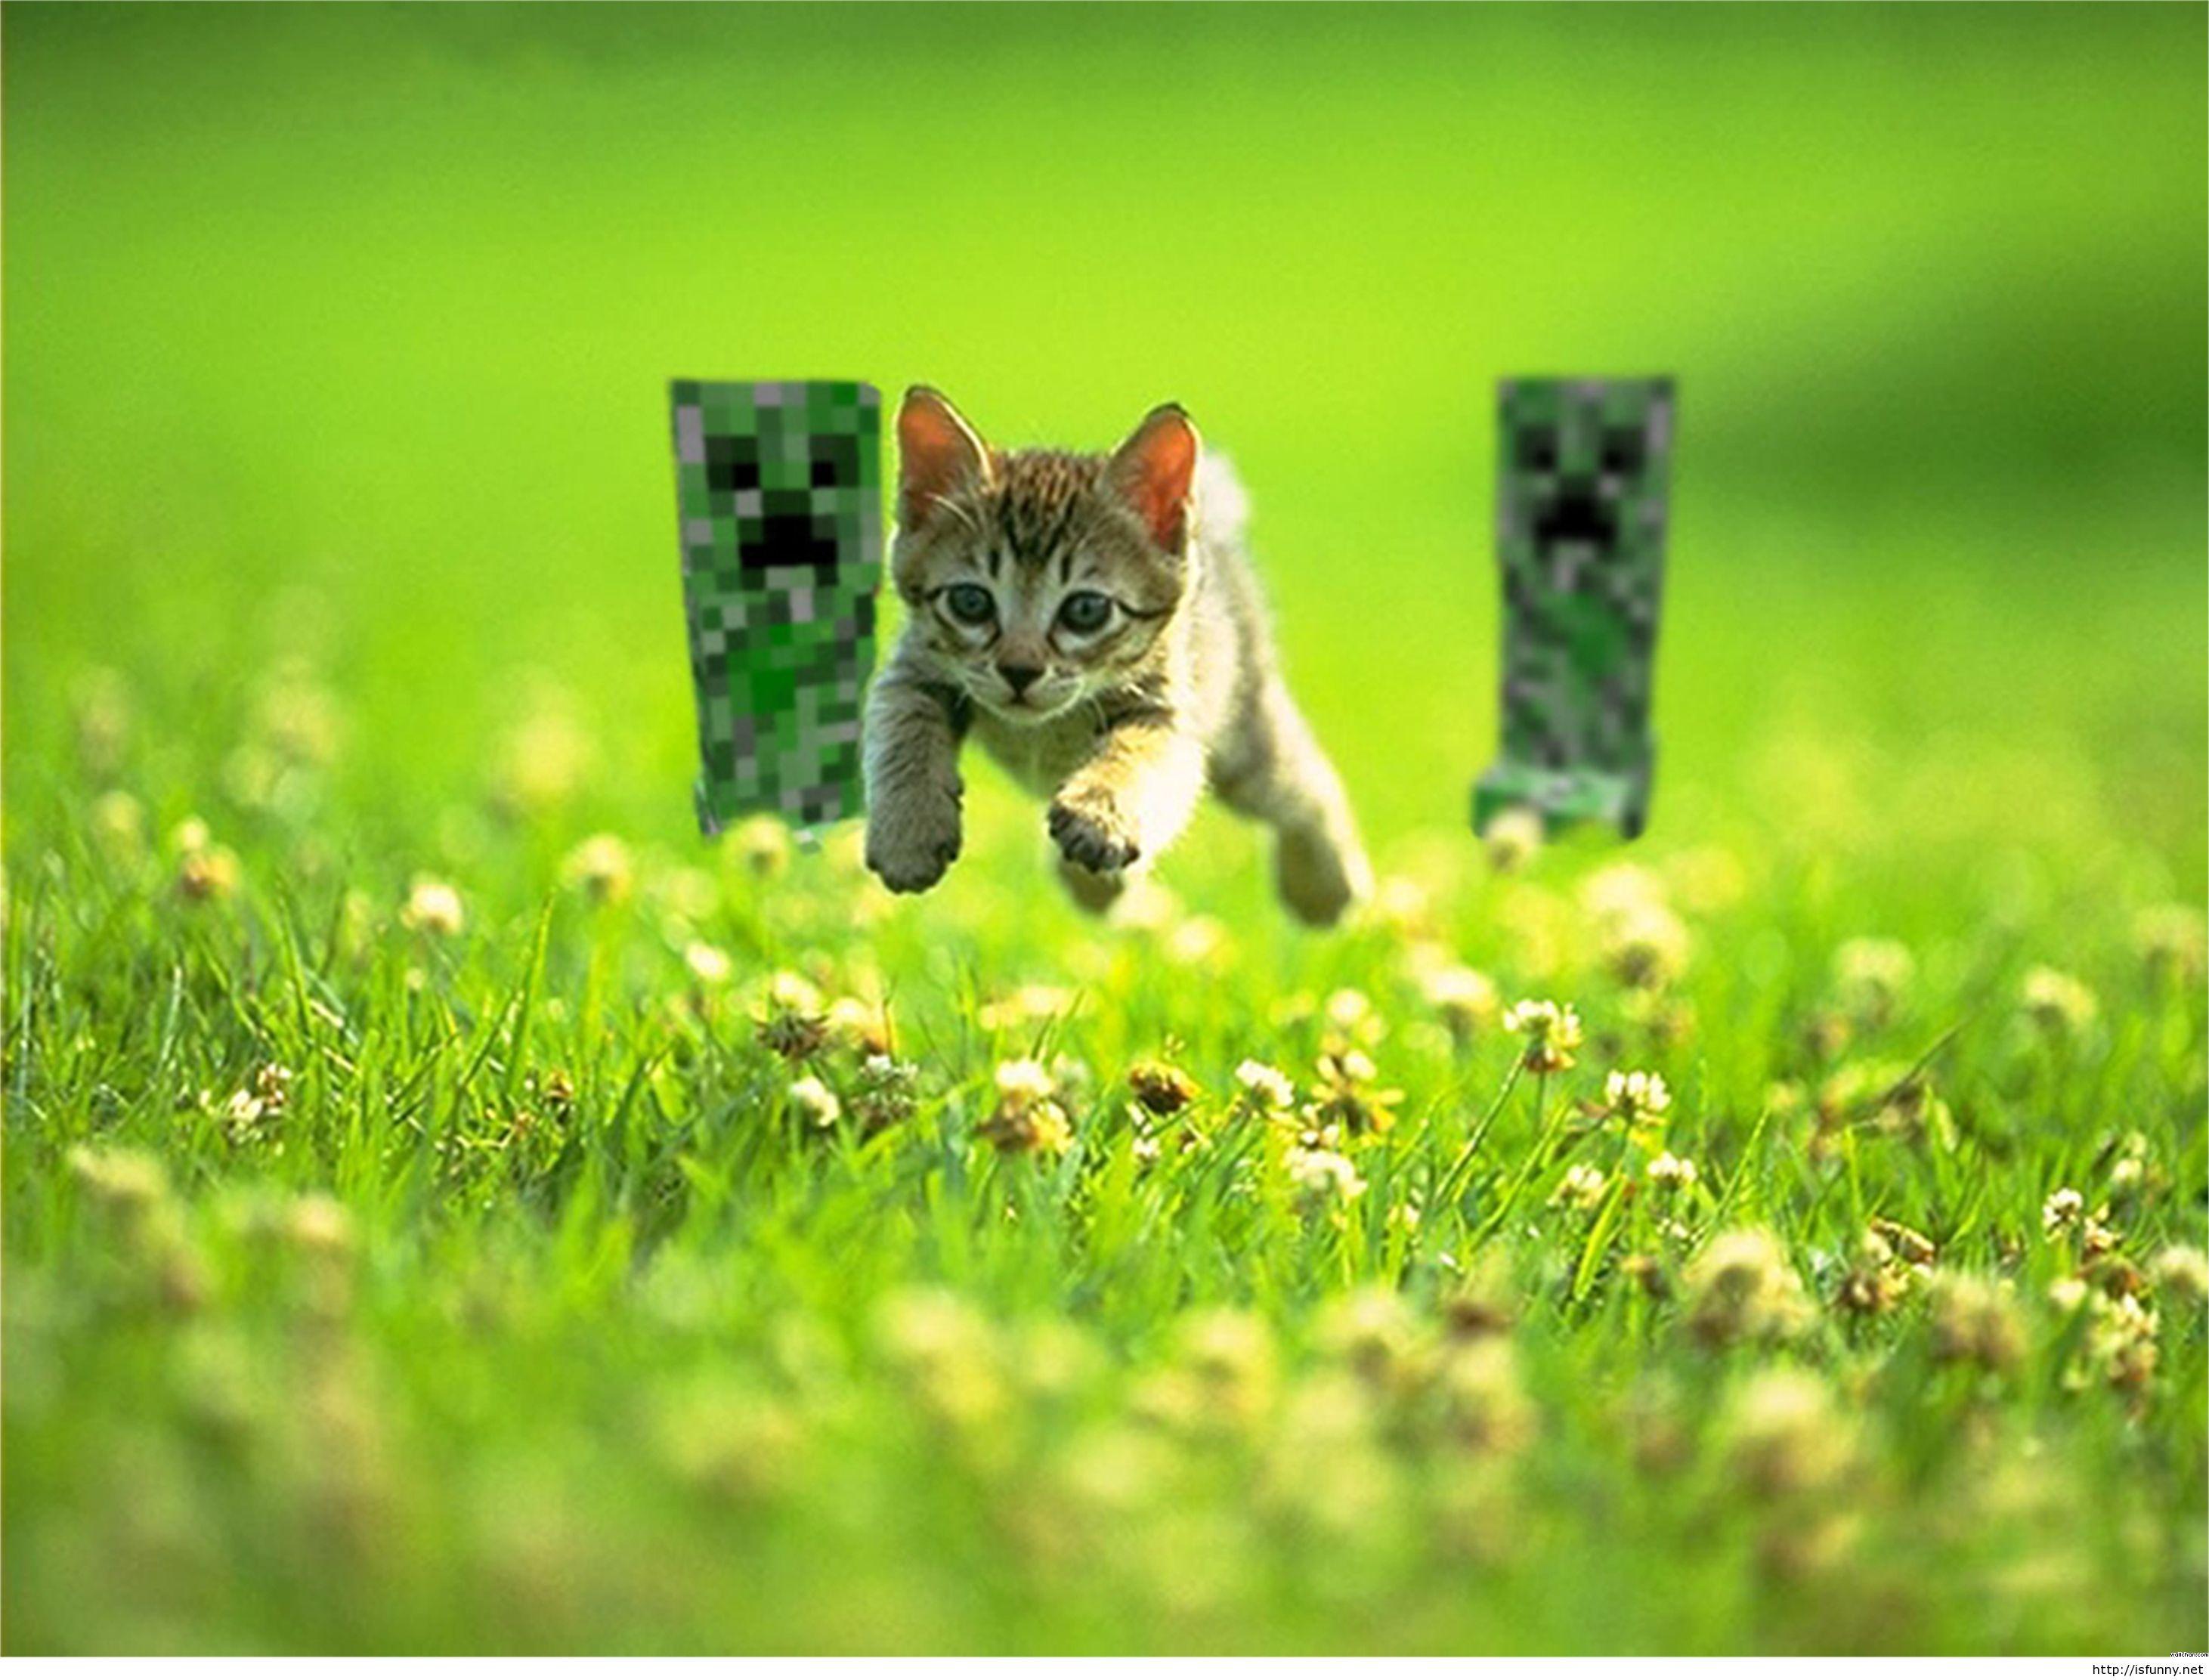 Funny minecraft cat wallpaper HD Pintast 2923x2223